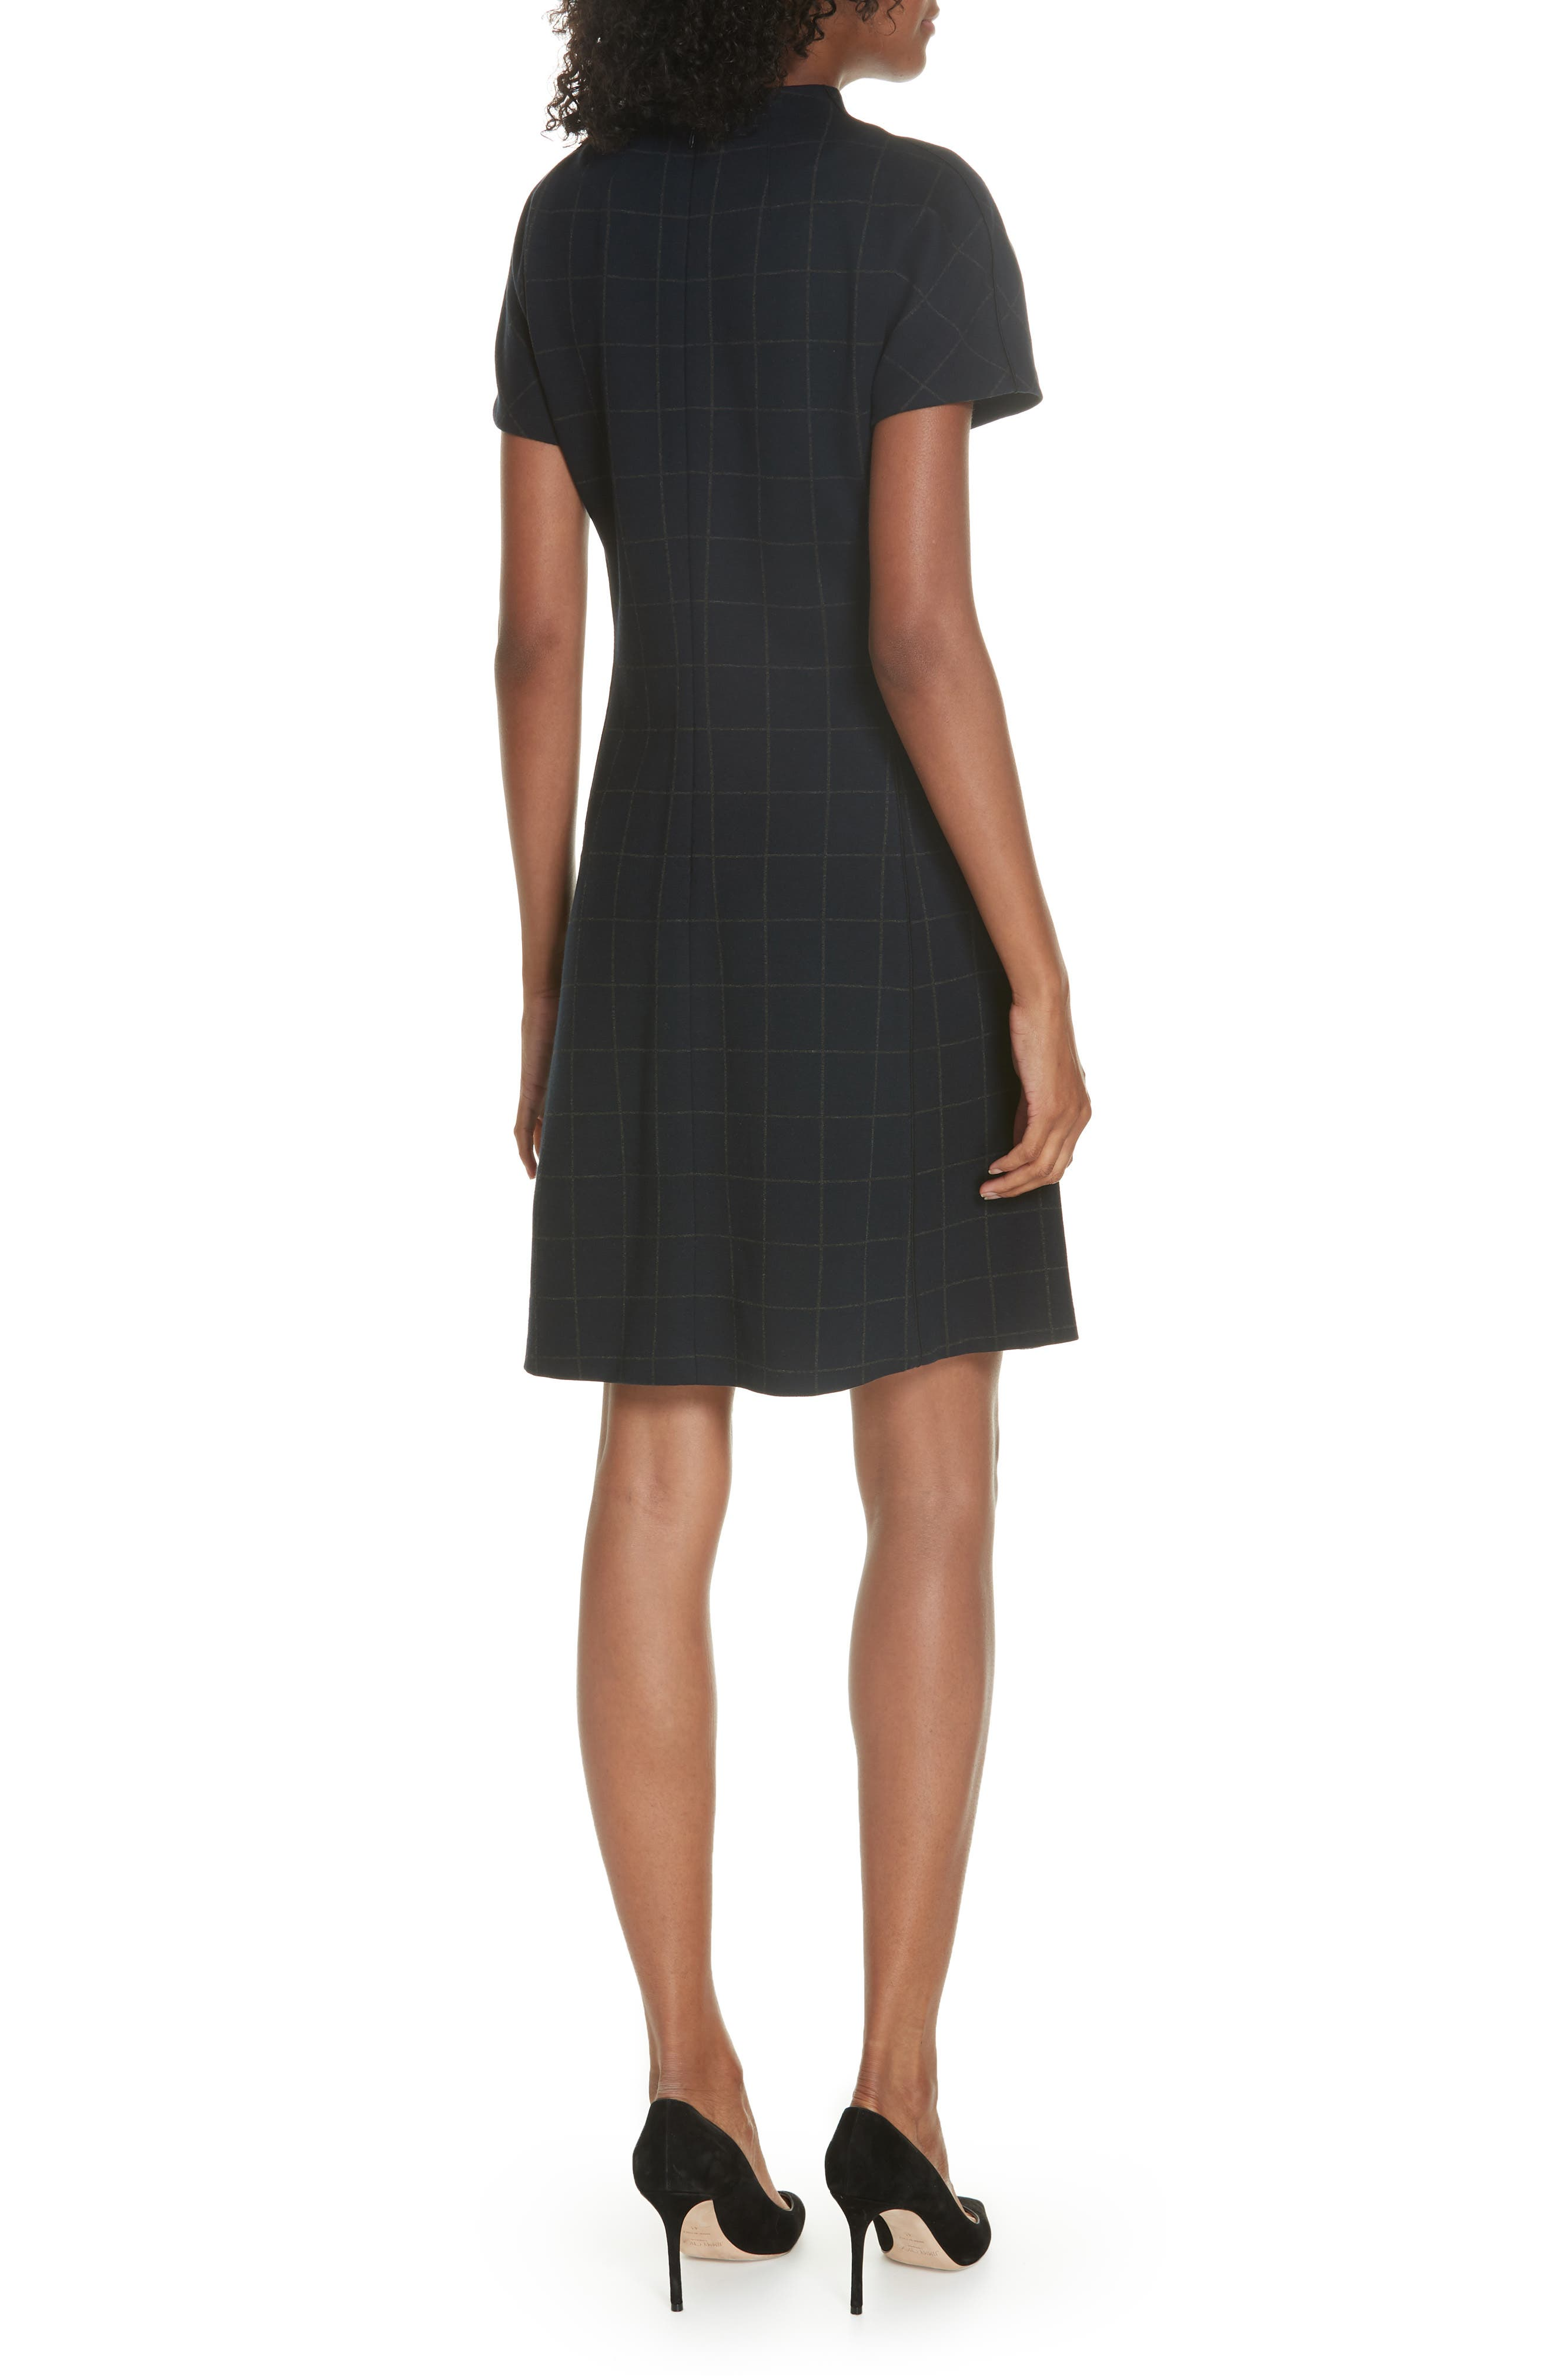 Windowpane Knit A-Line Dress,                             Alternate thumbnail 2, color,                             DEEP NAVY/ CHARCOAL MELANGE